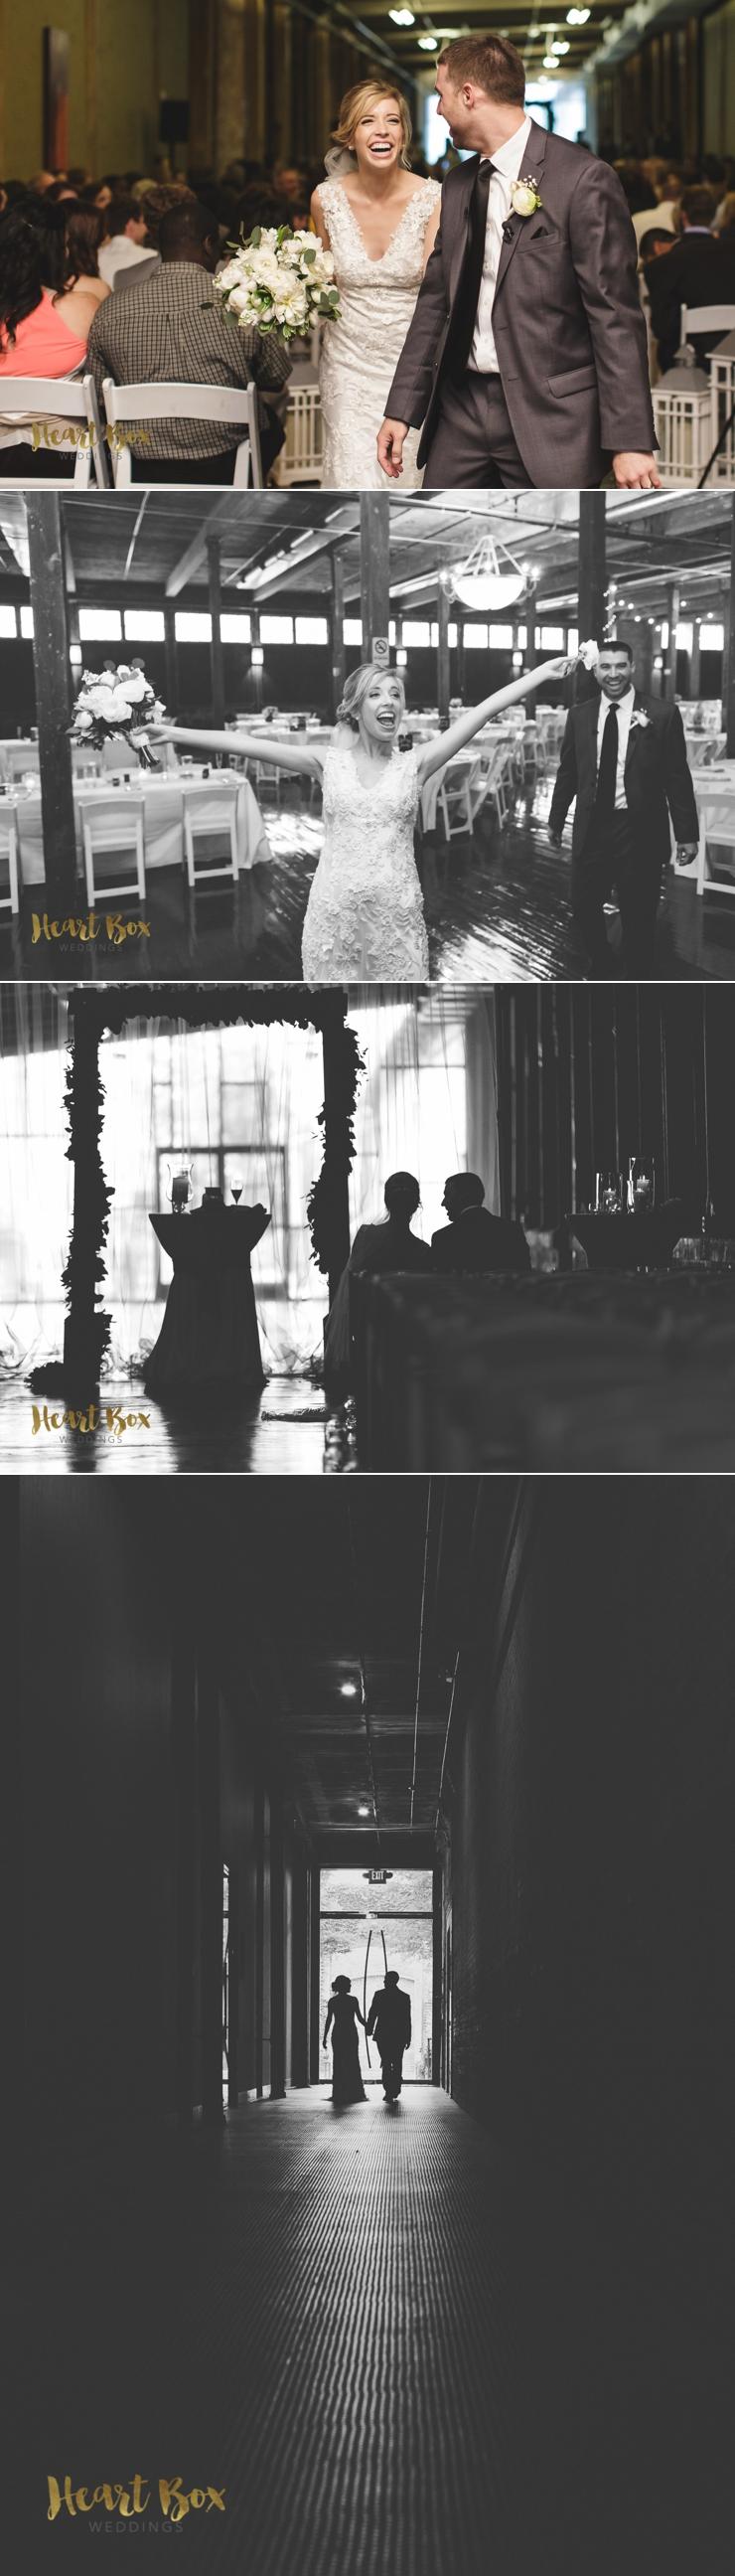 Popplewell Wedding Blog Collages 21.jpg